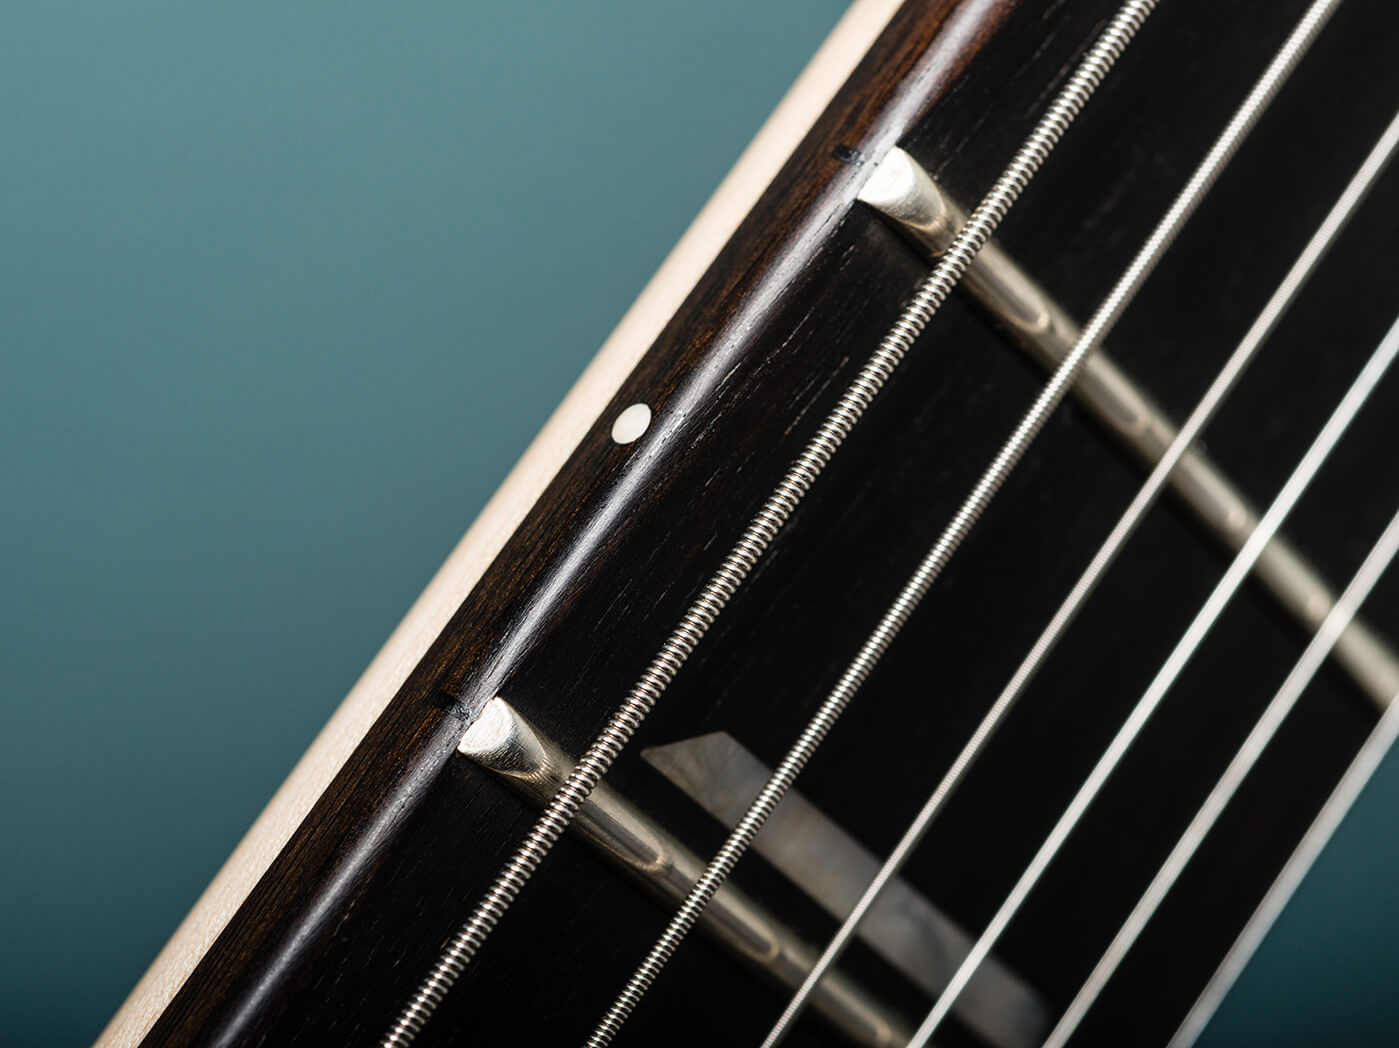 Chapman Guitars V2 ML2 Modern Standard fretboard radius close-up